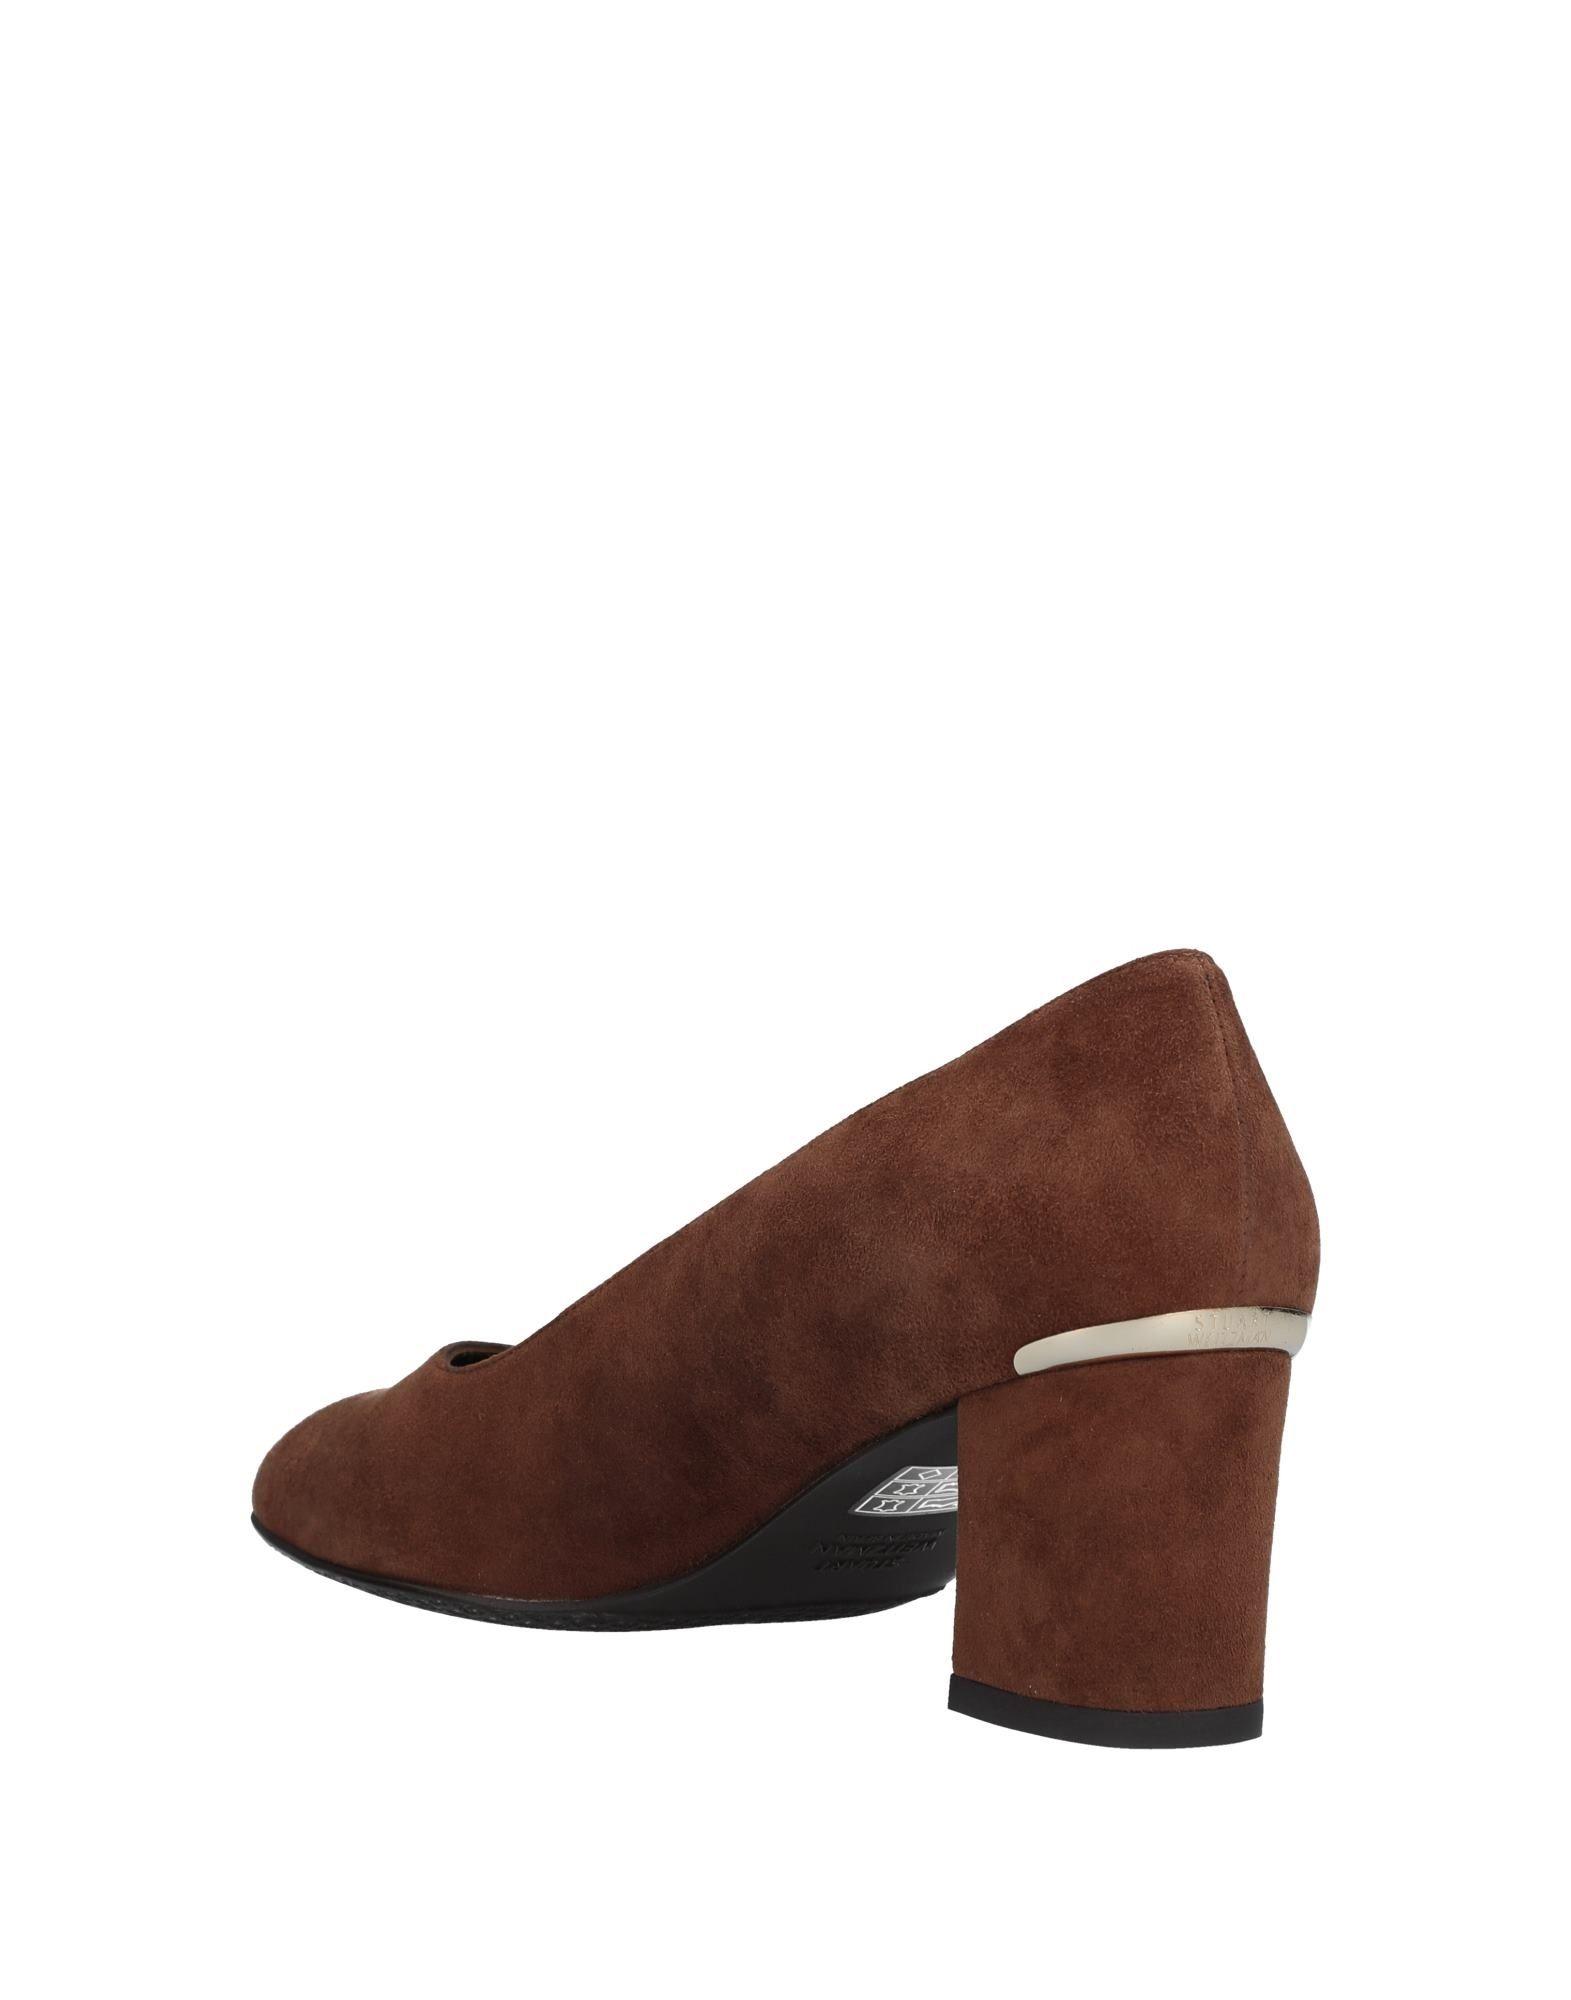 Rabatt Schuhe Stuart Weitzman Pumps Damen  11533442JD